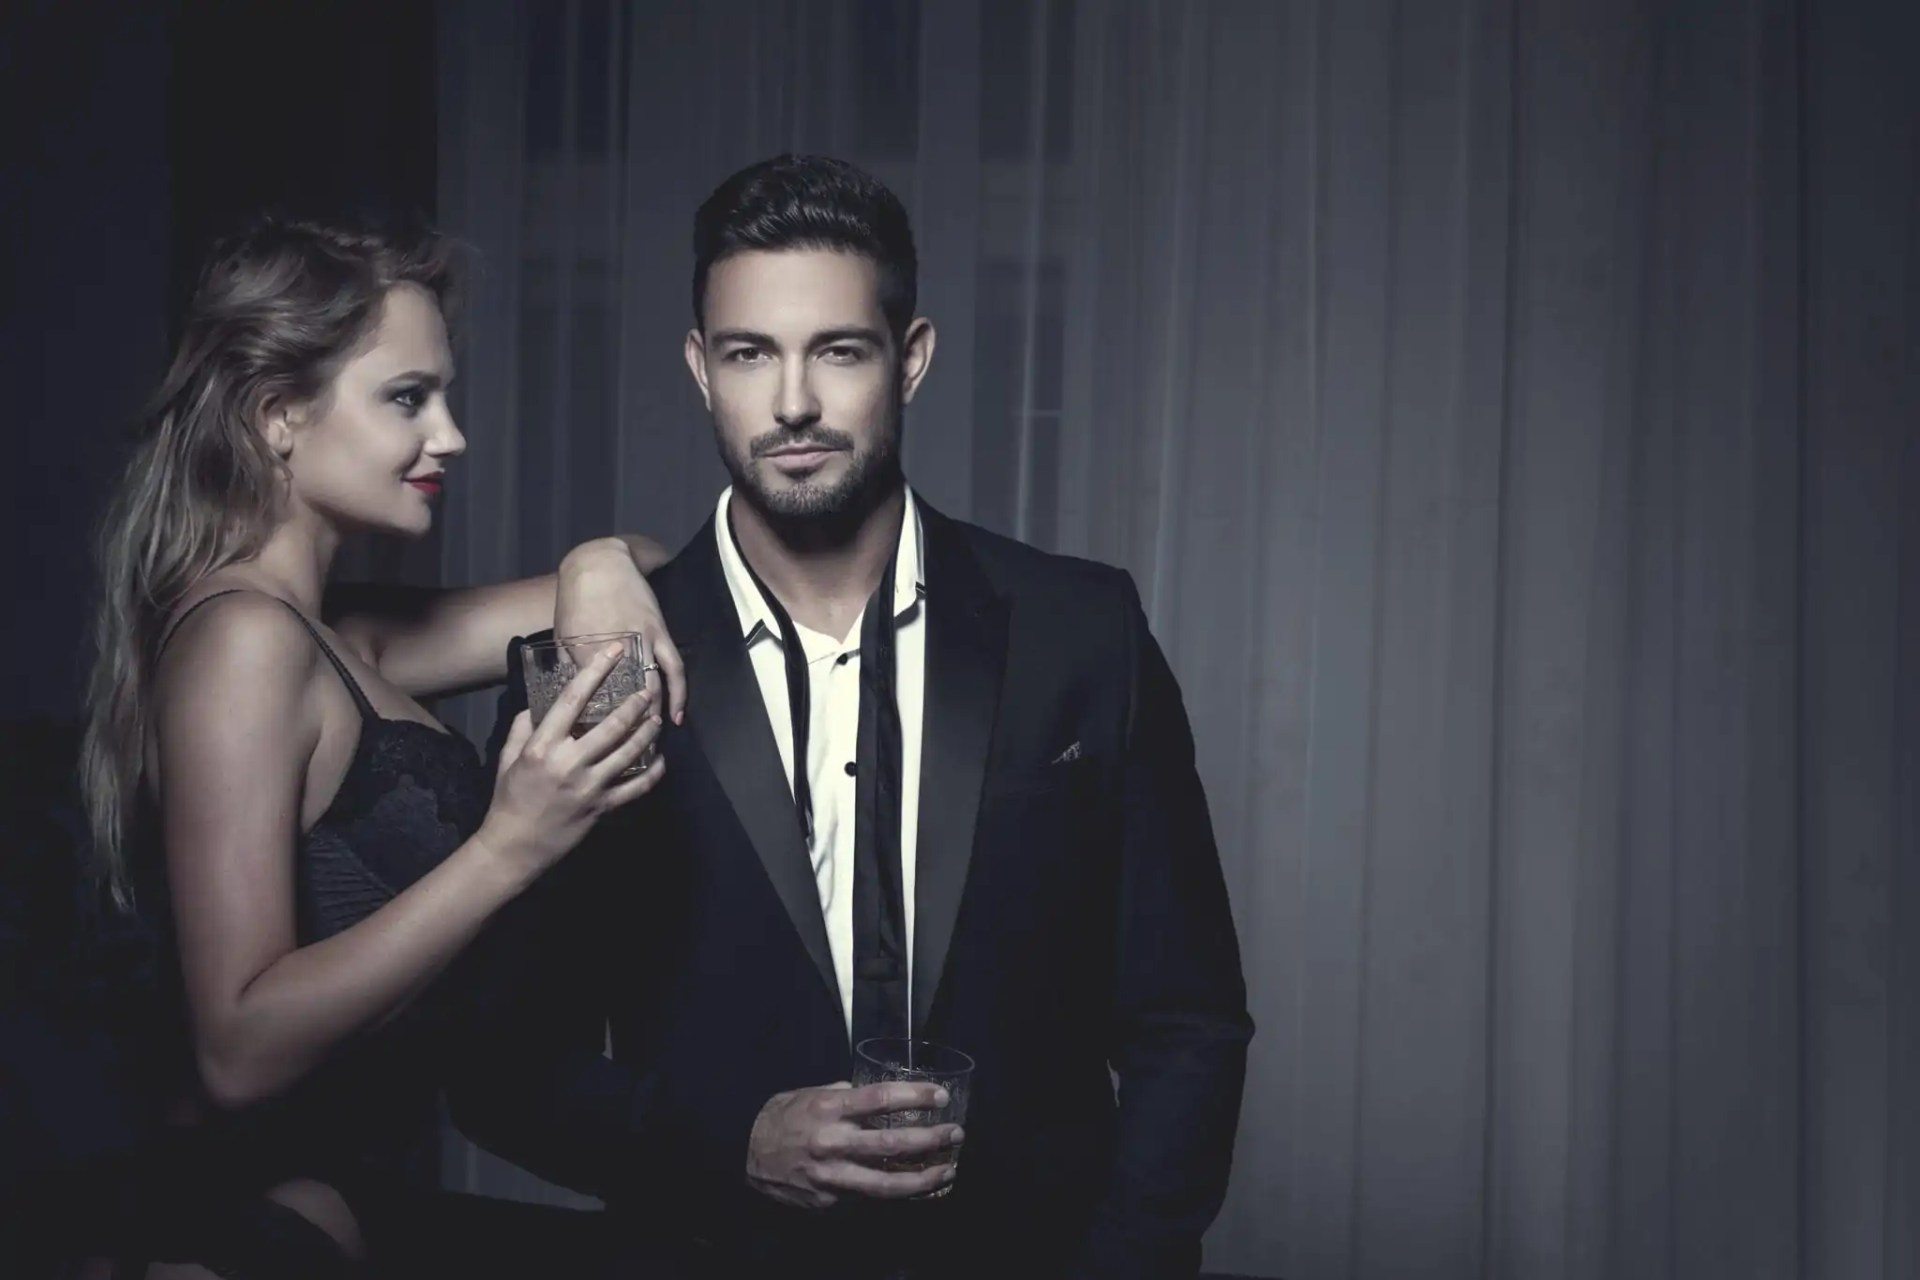 cocktail-attire-4